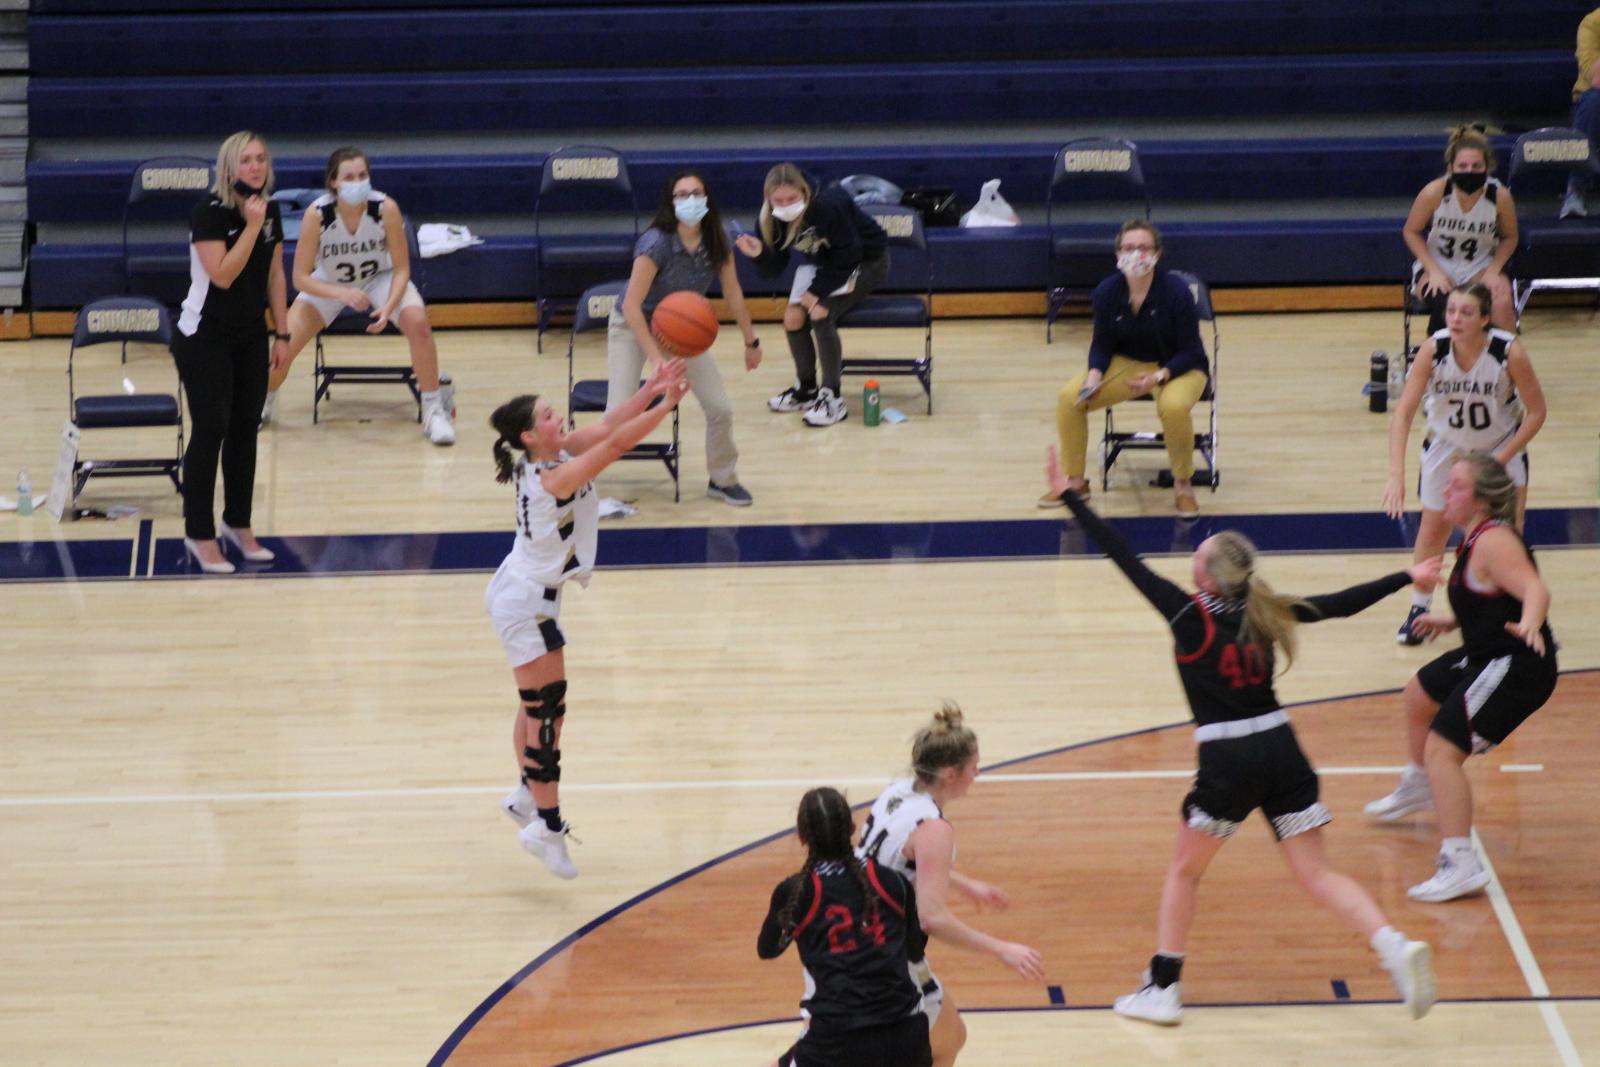 Varsity Girls Basketball vs. South Central  11/14/20  (Photo Gallery)